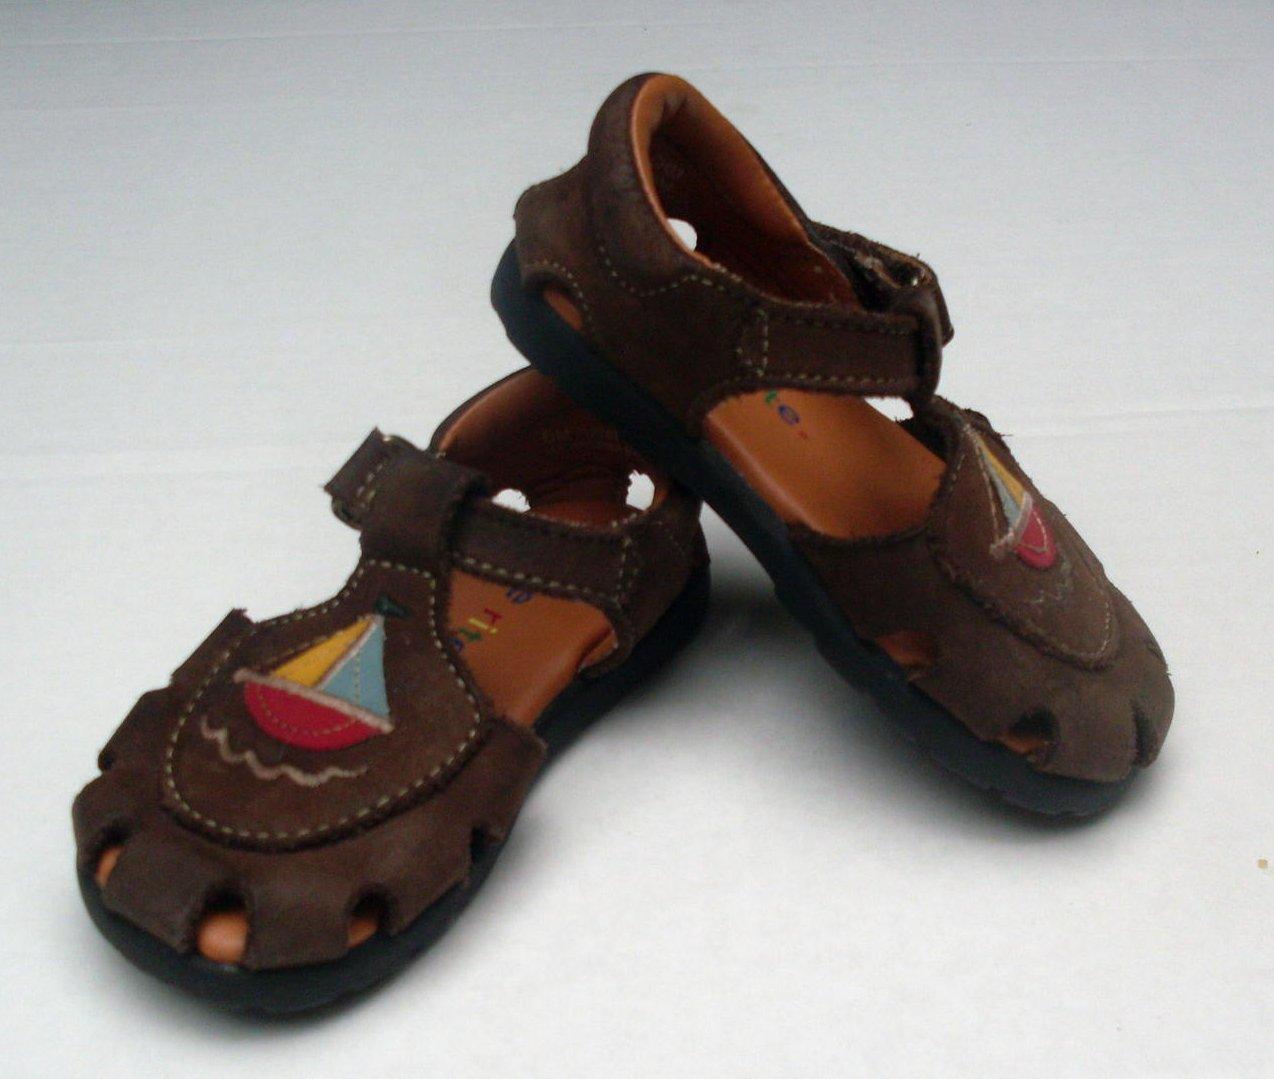 Stride Rite Toddler Girls Leather Sandal 5M Brown Sailboat